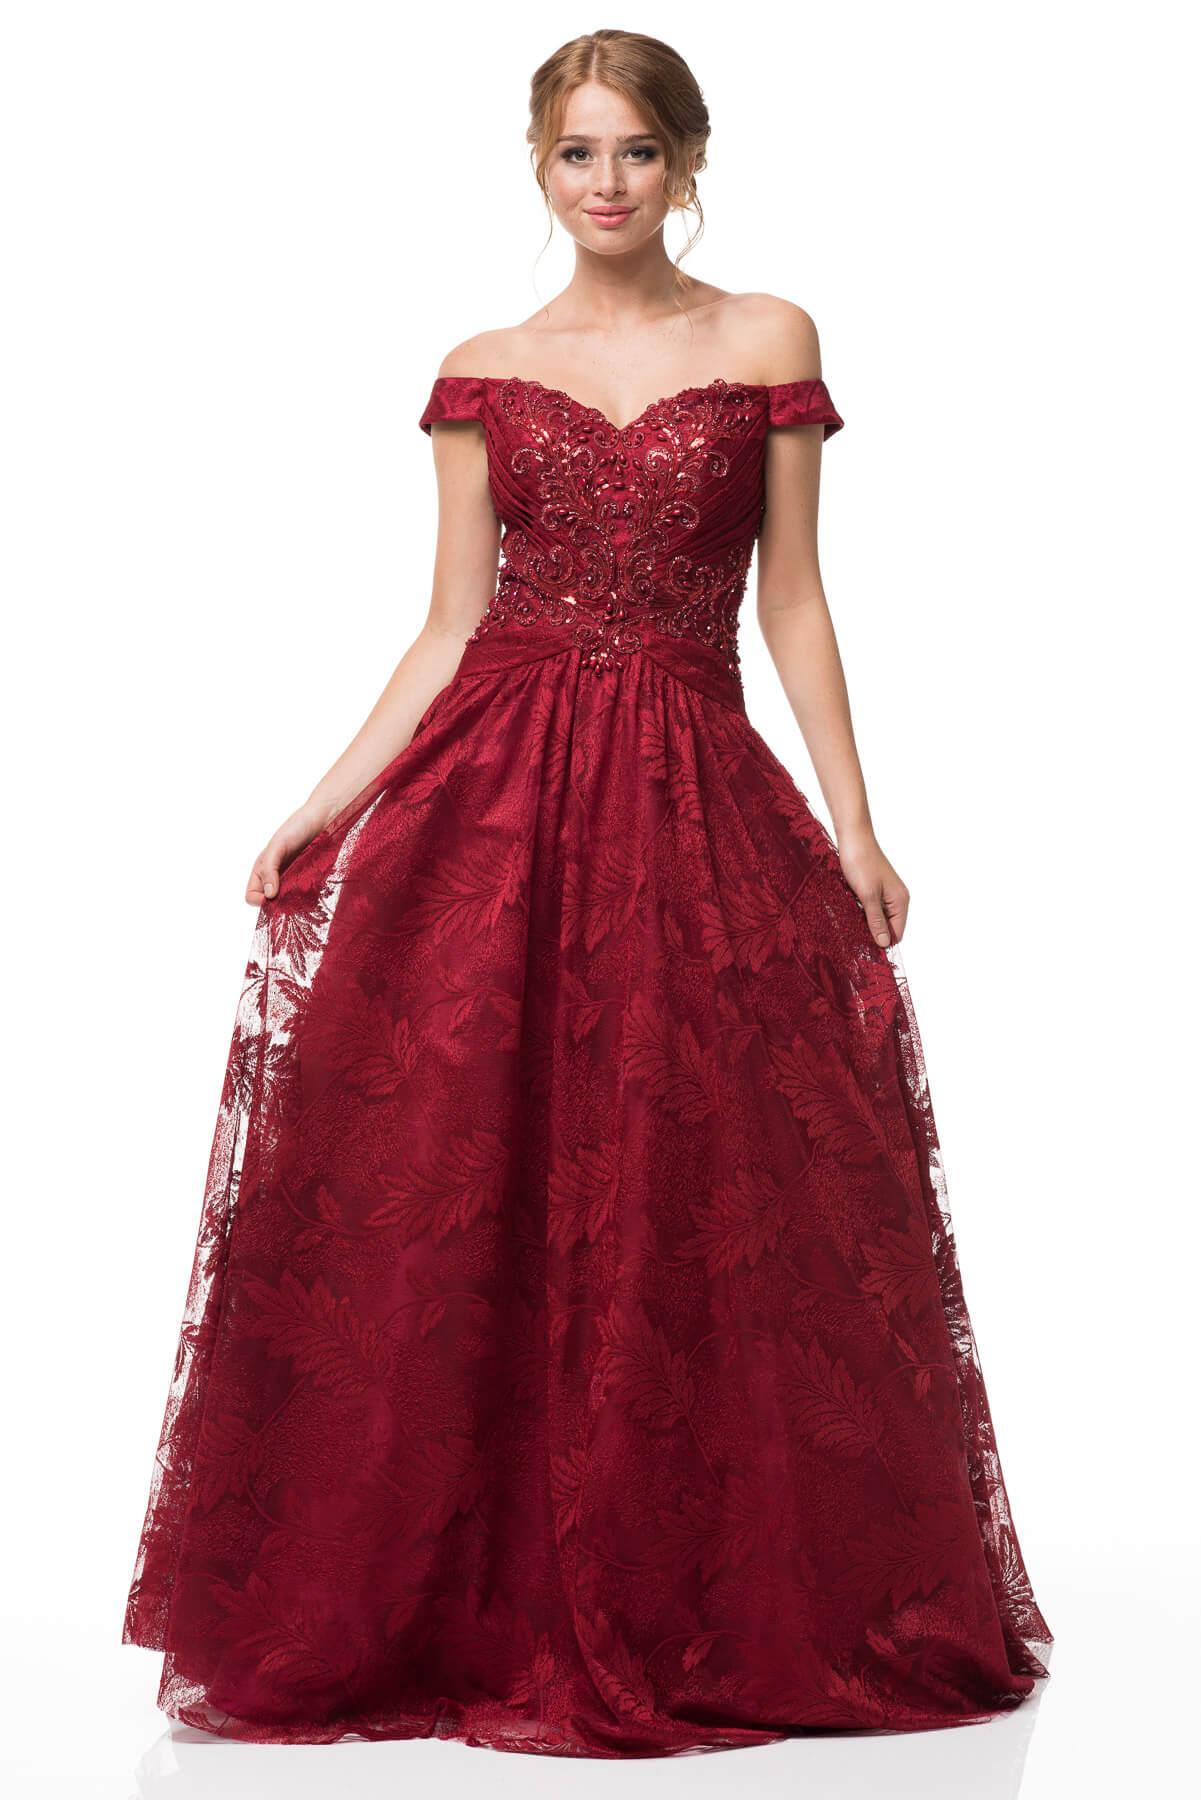 Shangri-La Dresses | Prom Dress in San Antonio, TX